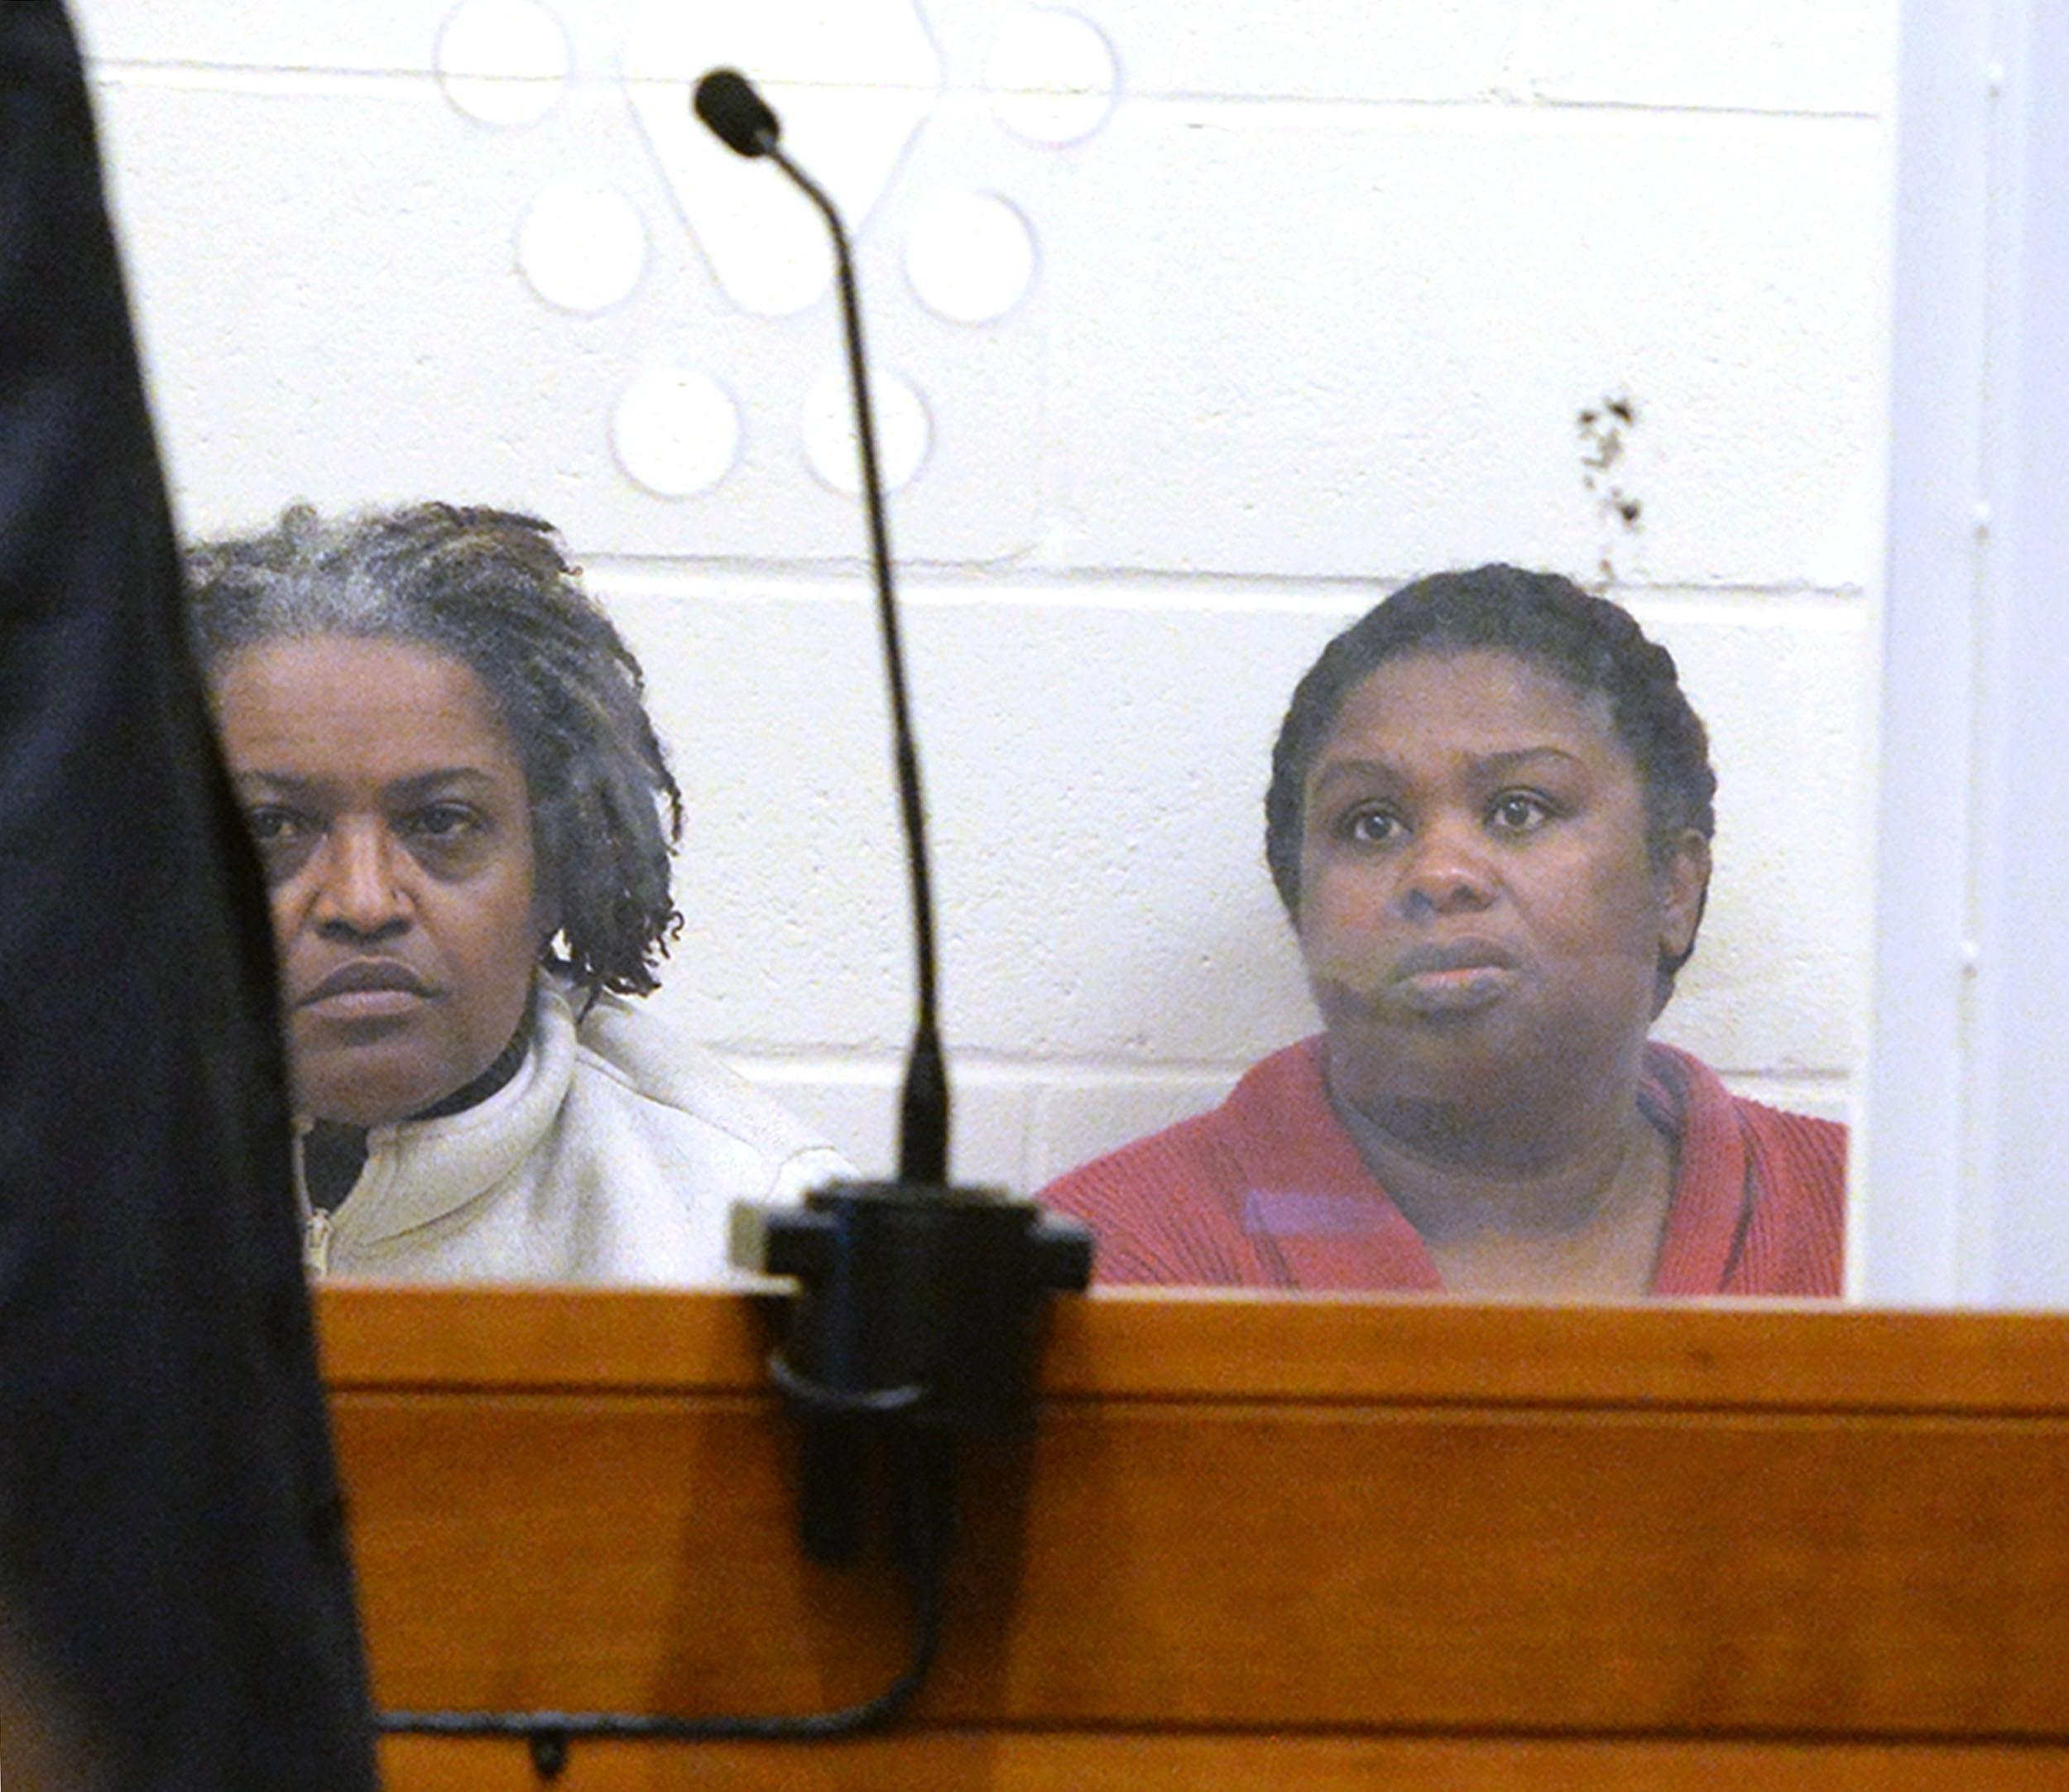 2 women accused of burning 5-year-old girl in voodoo ritual, police